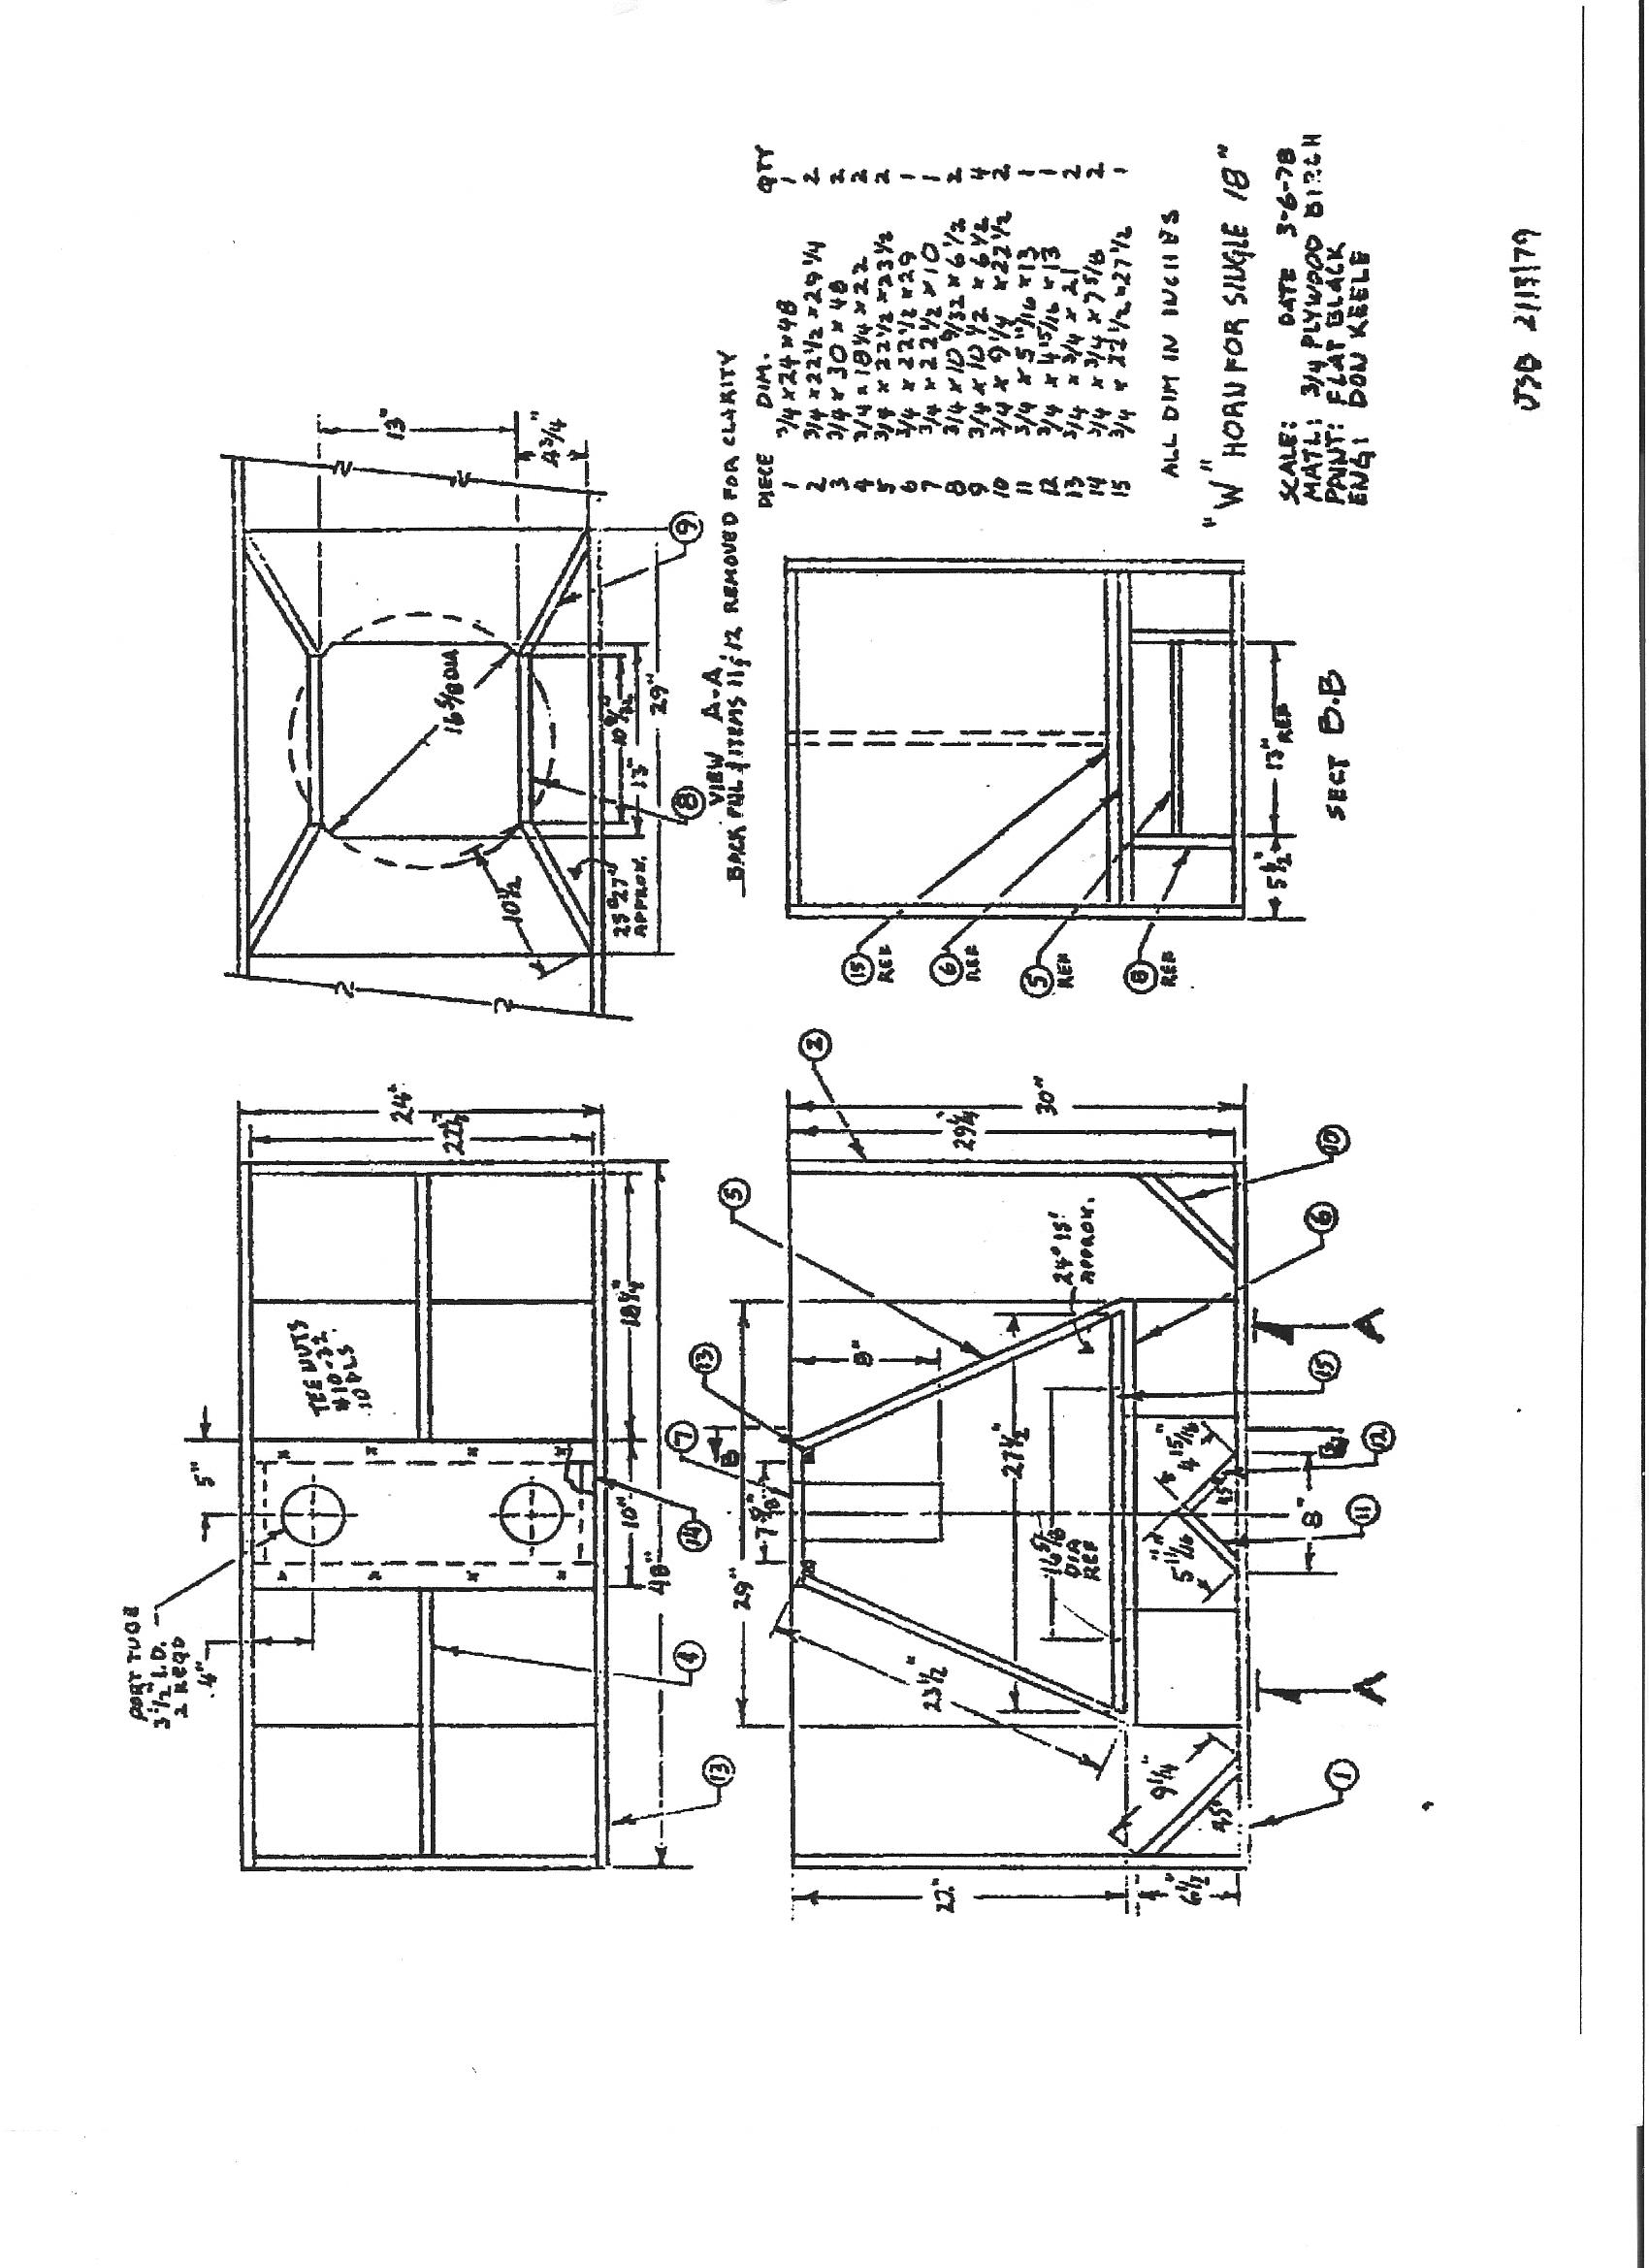 Ev Speaker Plans   Wiring Diagram Database